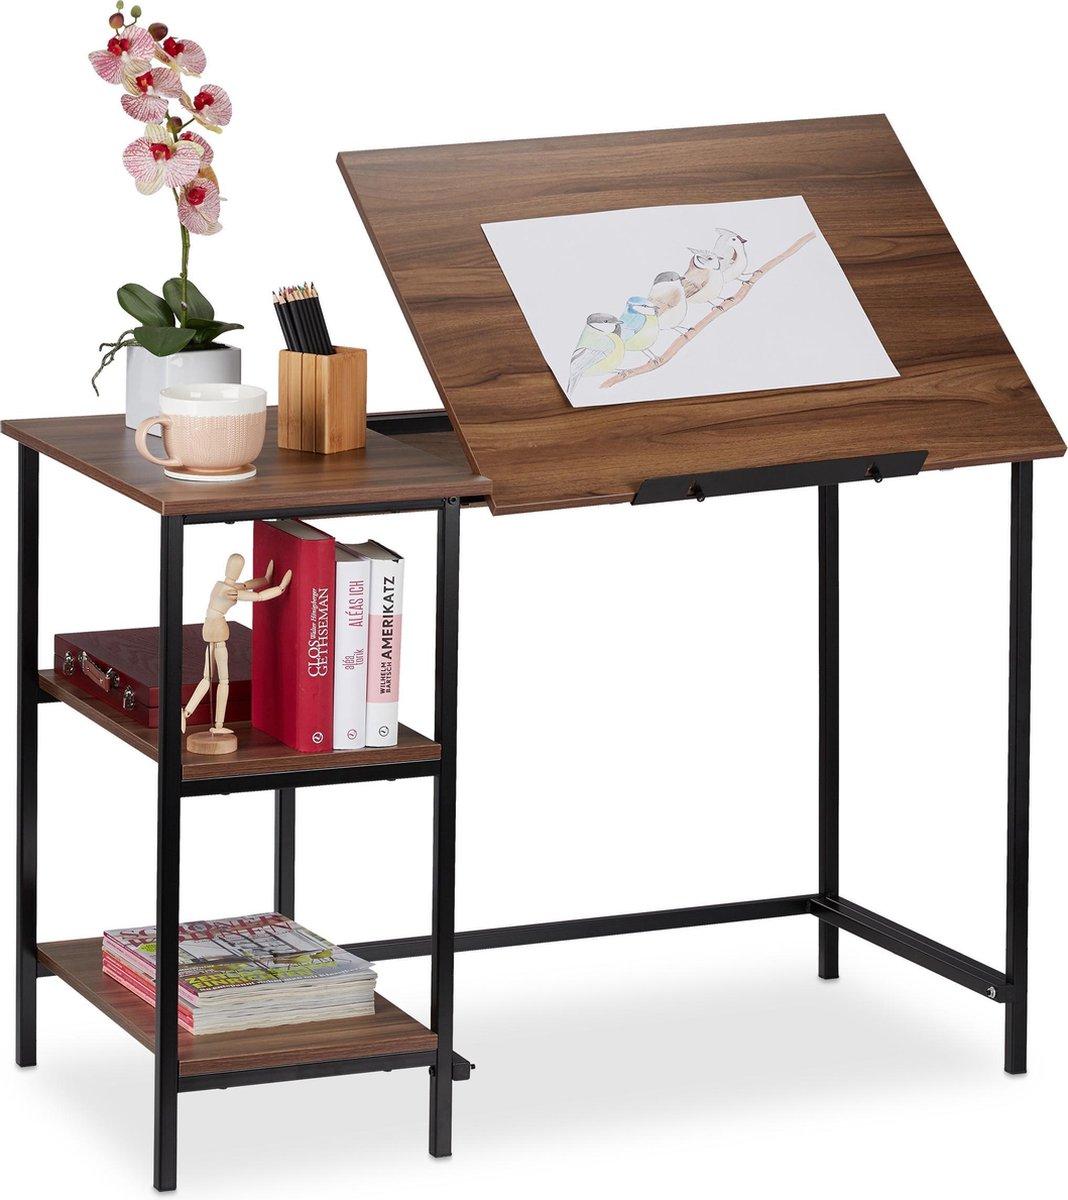 relaxdays bureau kantelbaar - tekentafel - computertafel - laptoptafel - 3 vakken Hout / zwart